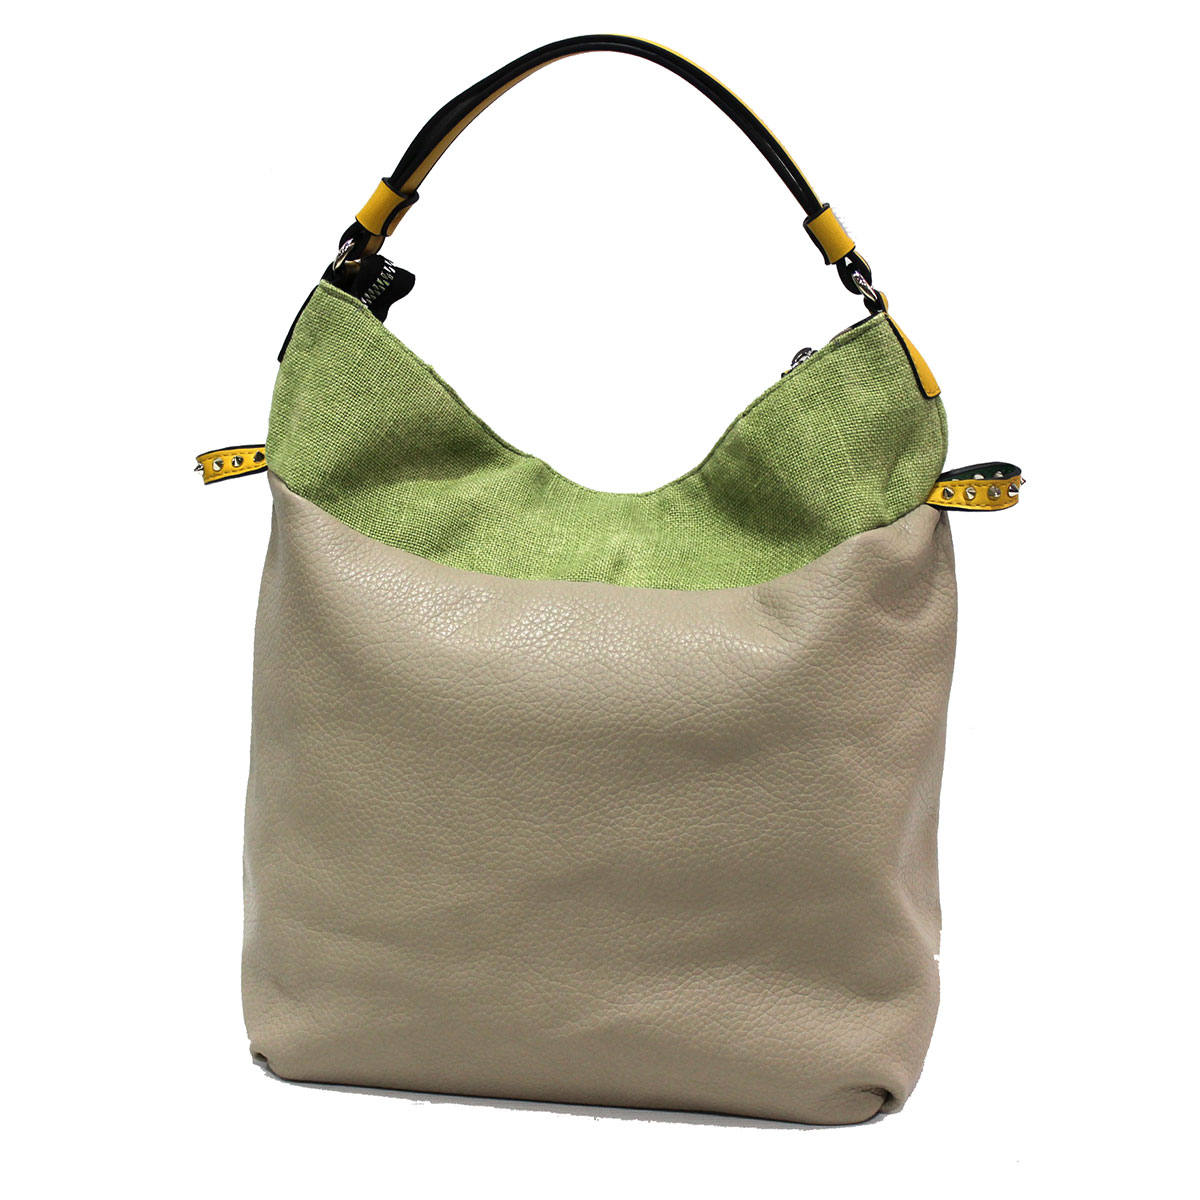 e5fc026675cb Leather hobo bag brown women39s handbag shoulder strap